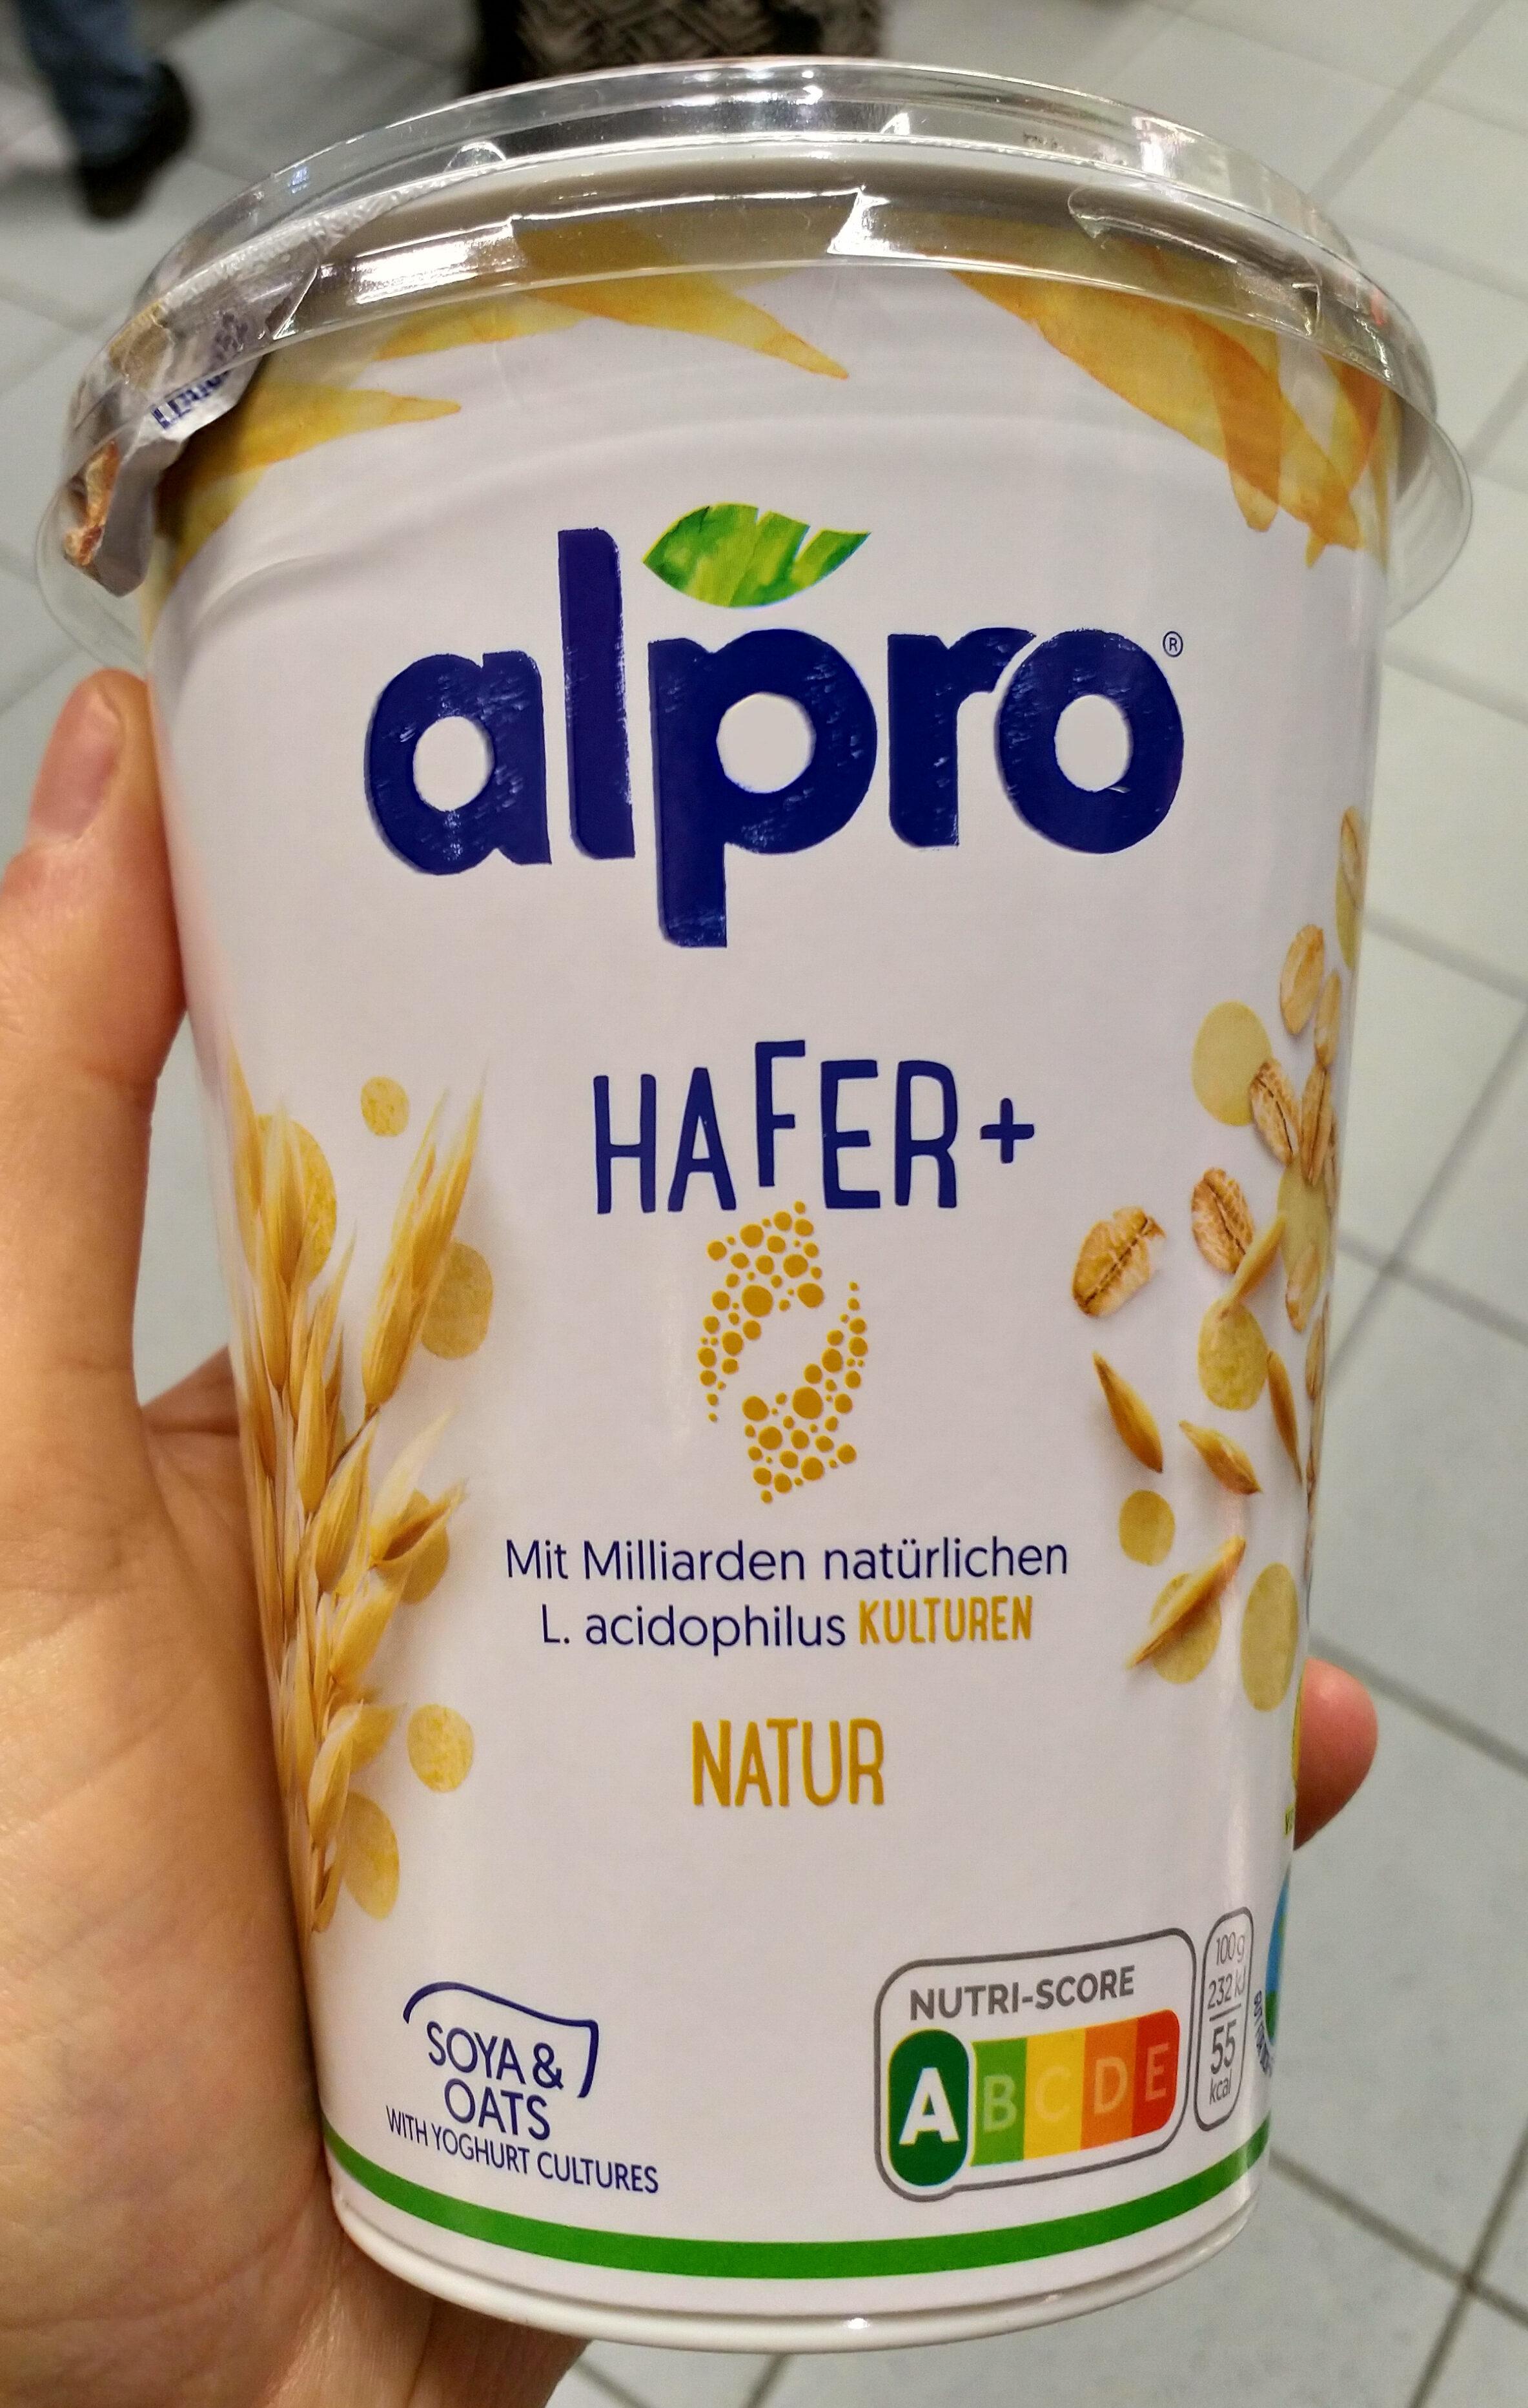 Hafer  Natur - Product - de